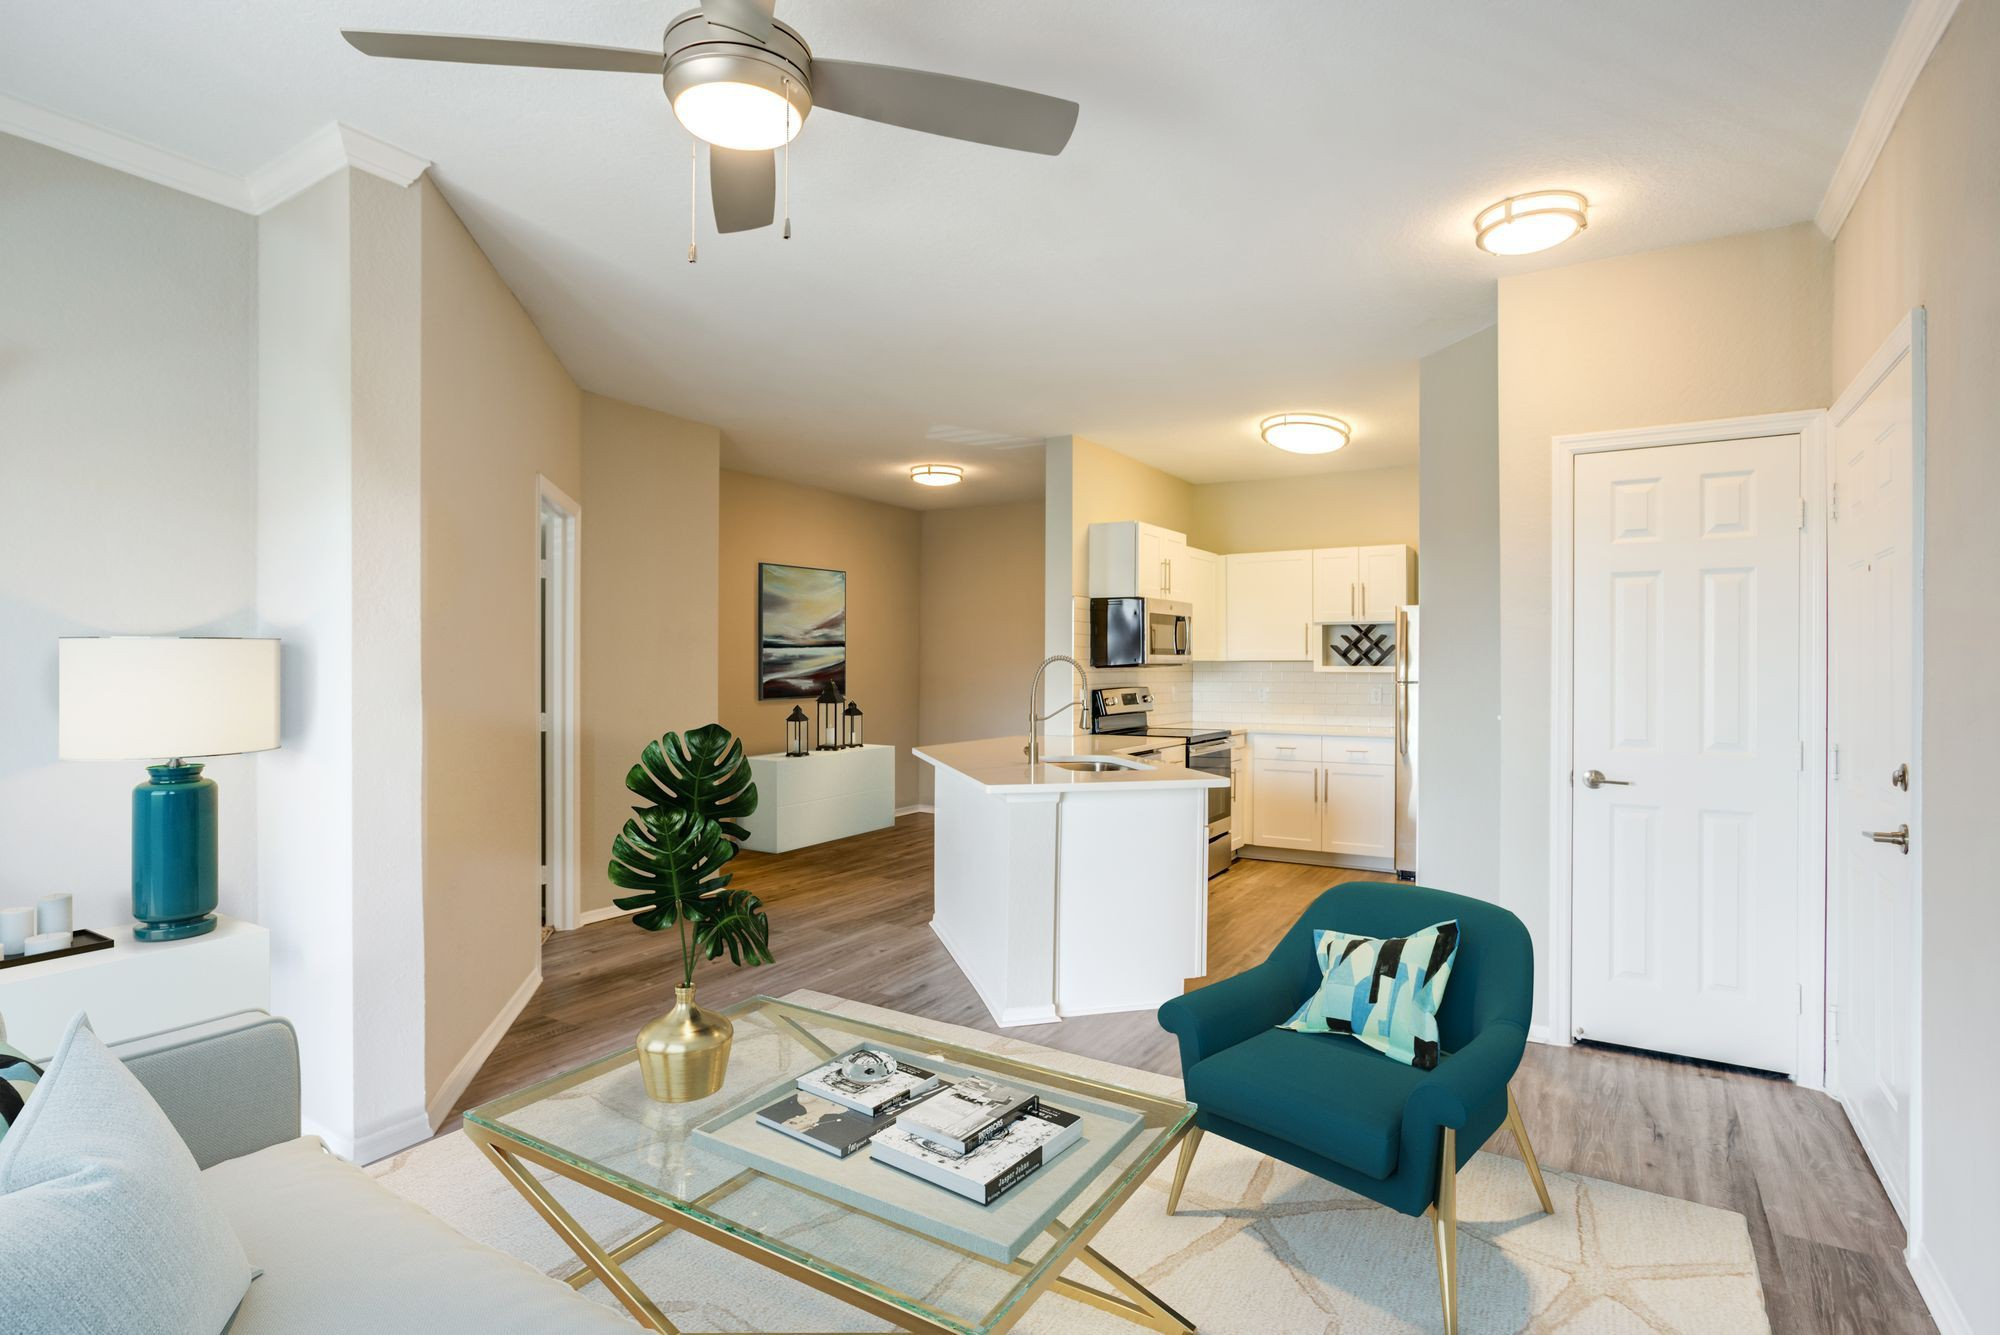 Apartments Near Eckerd Verandahs of Brighton Bay for Eckerd College Students in Saint Petersburg, FL